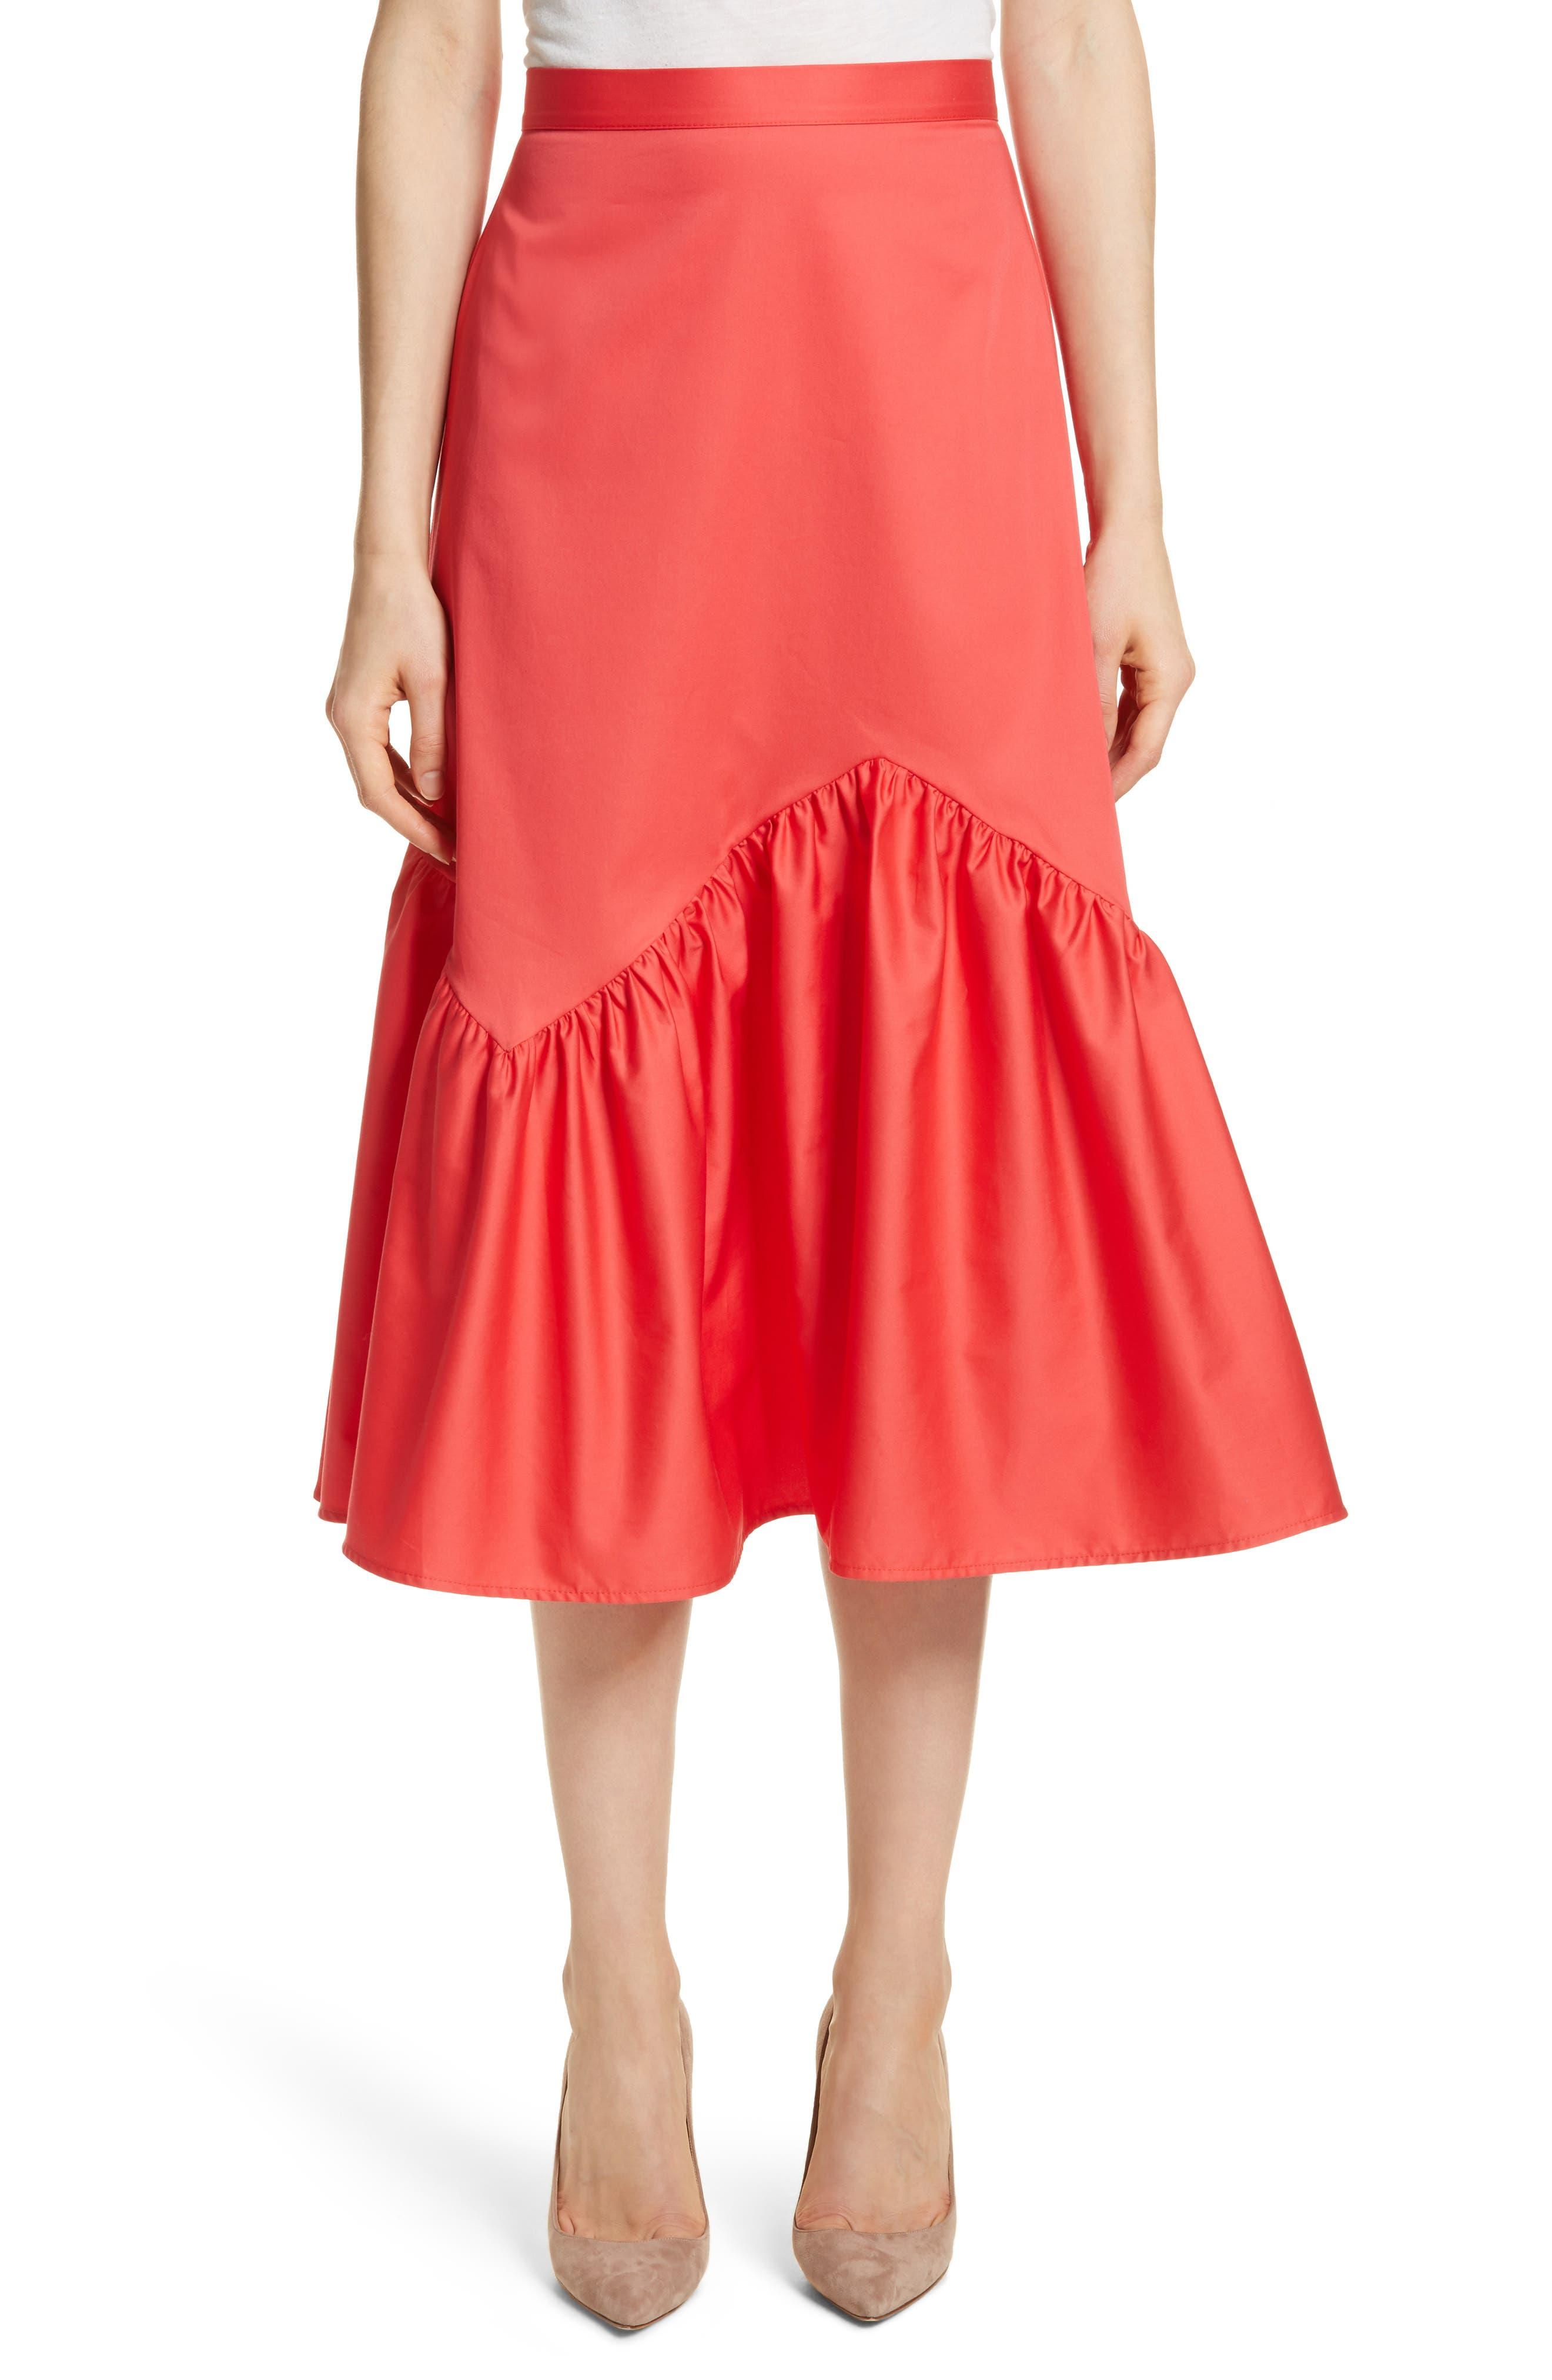 Prose & Poetry Tyra Midi Skirt,                             Main thumbnail 1, color,                             Watermelon